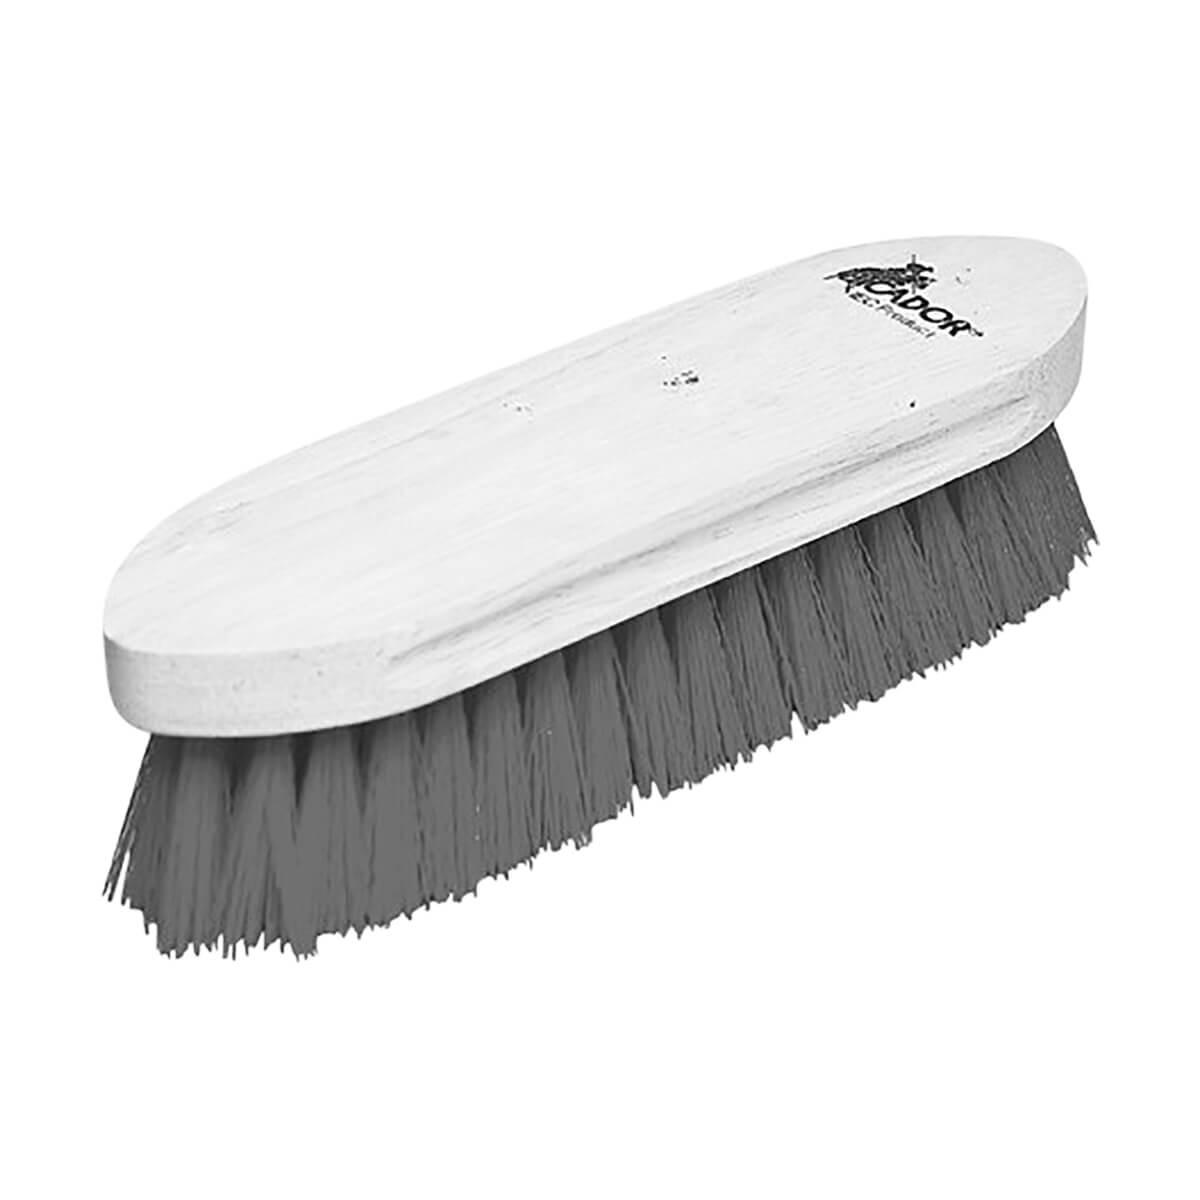 Dandy Brush - Medium Bristle